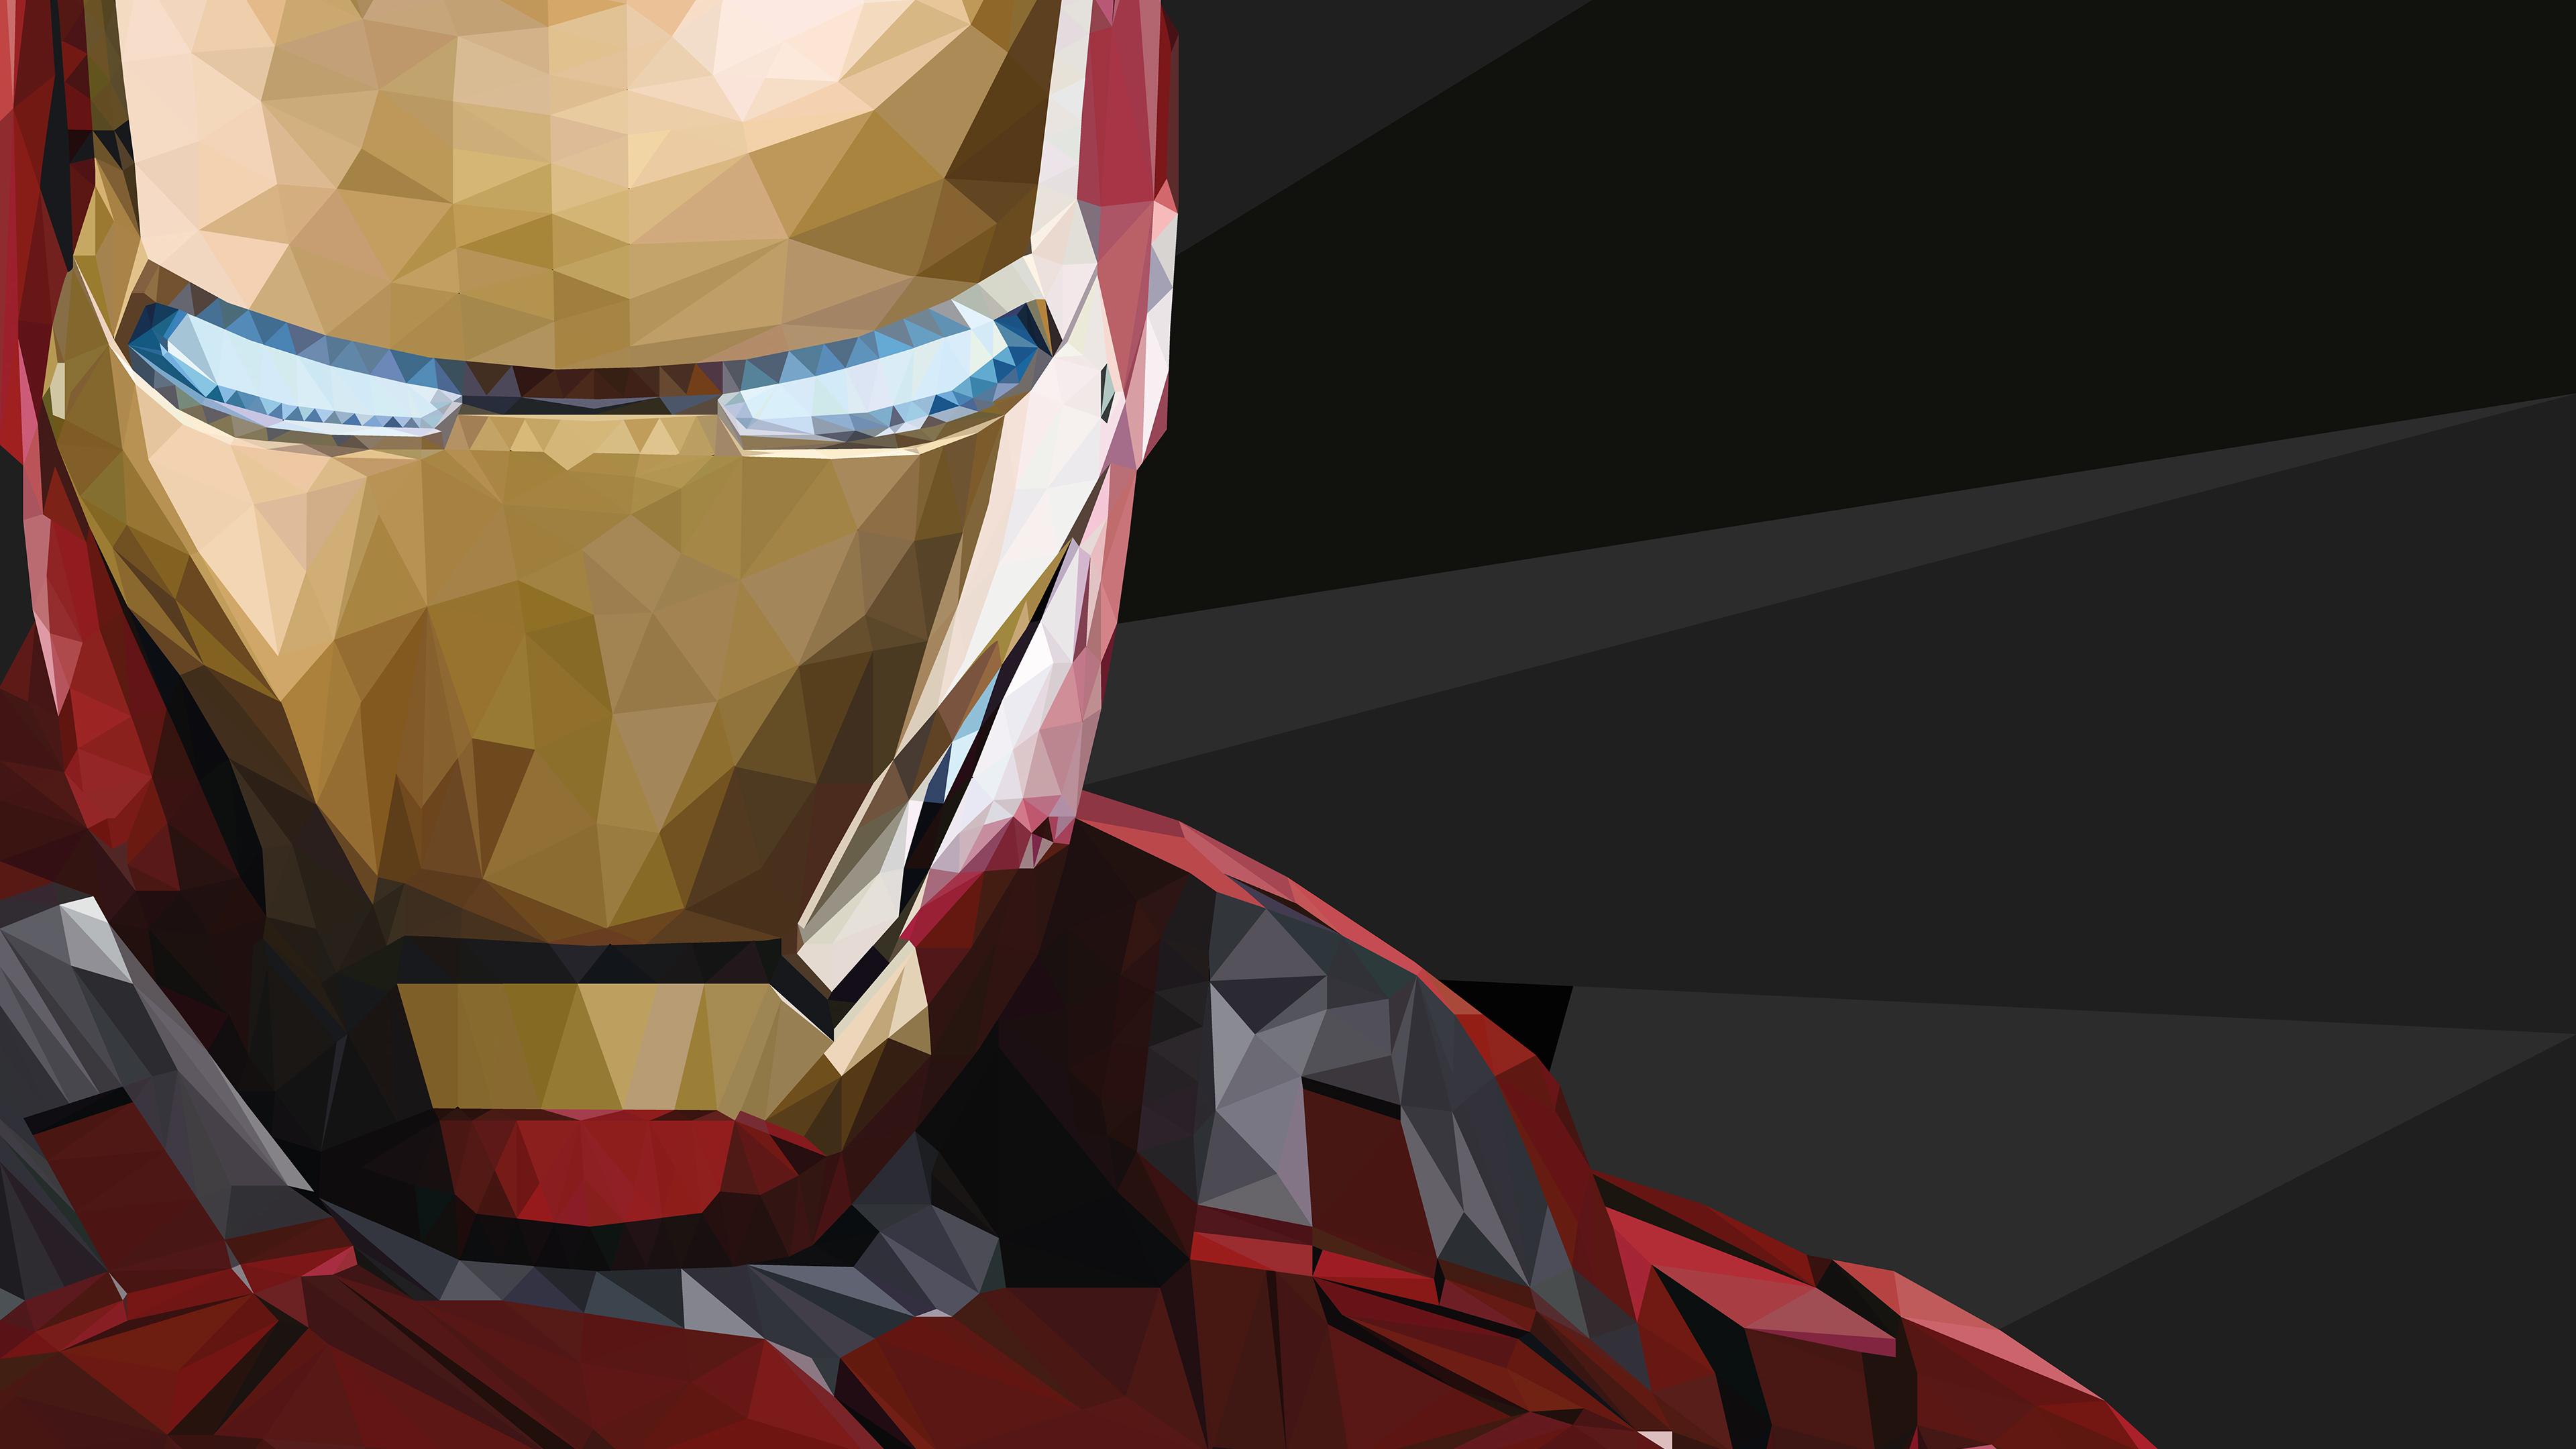 iron man low poly 1536522677 - Iron Man Low Poly - superheroes wallpapers, iron man wallpapers, hd-wallpapers, digital art wallpapers, behance wallpapers, artwork wallpapers, artist wallpapers, 4k-wallpapers